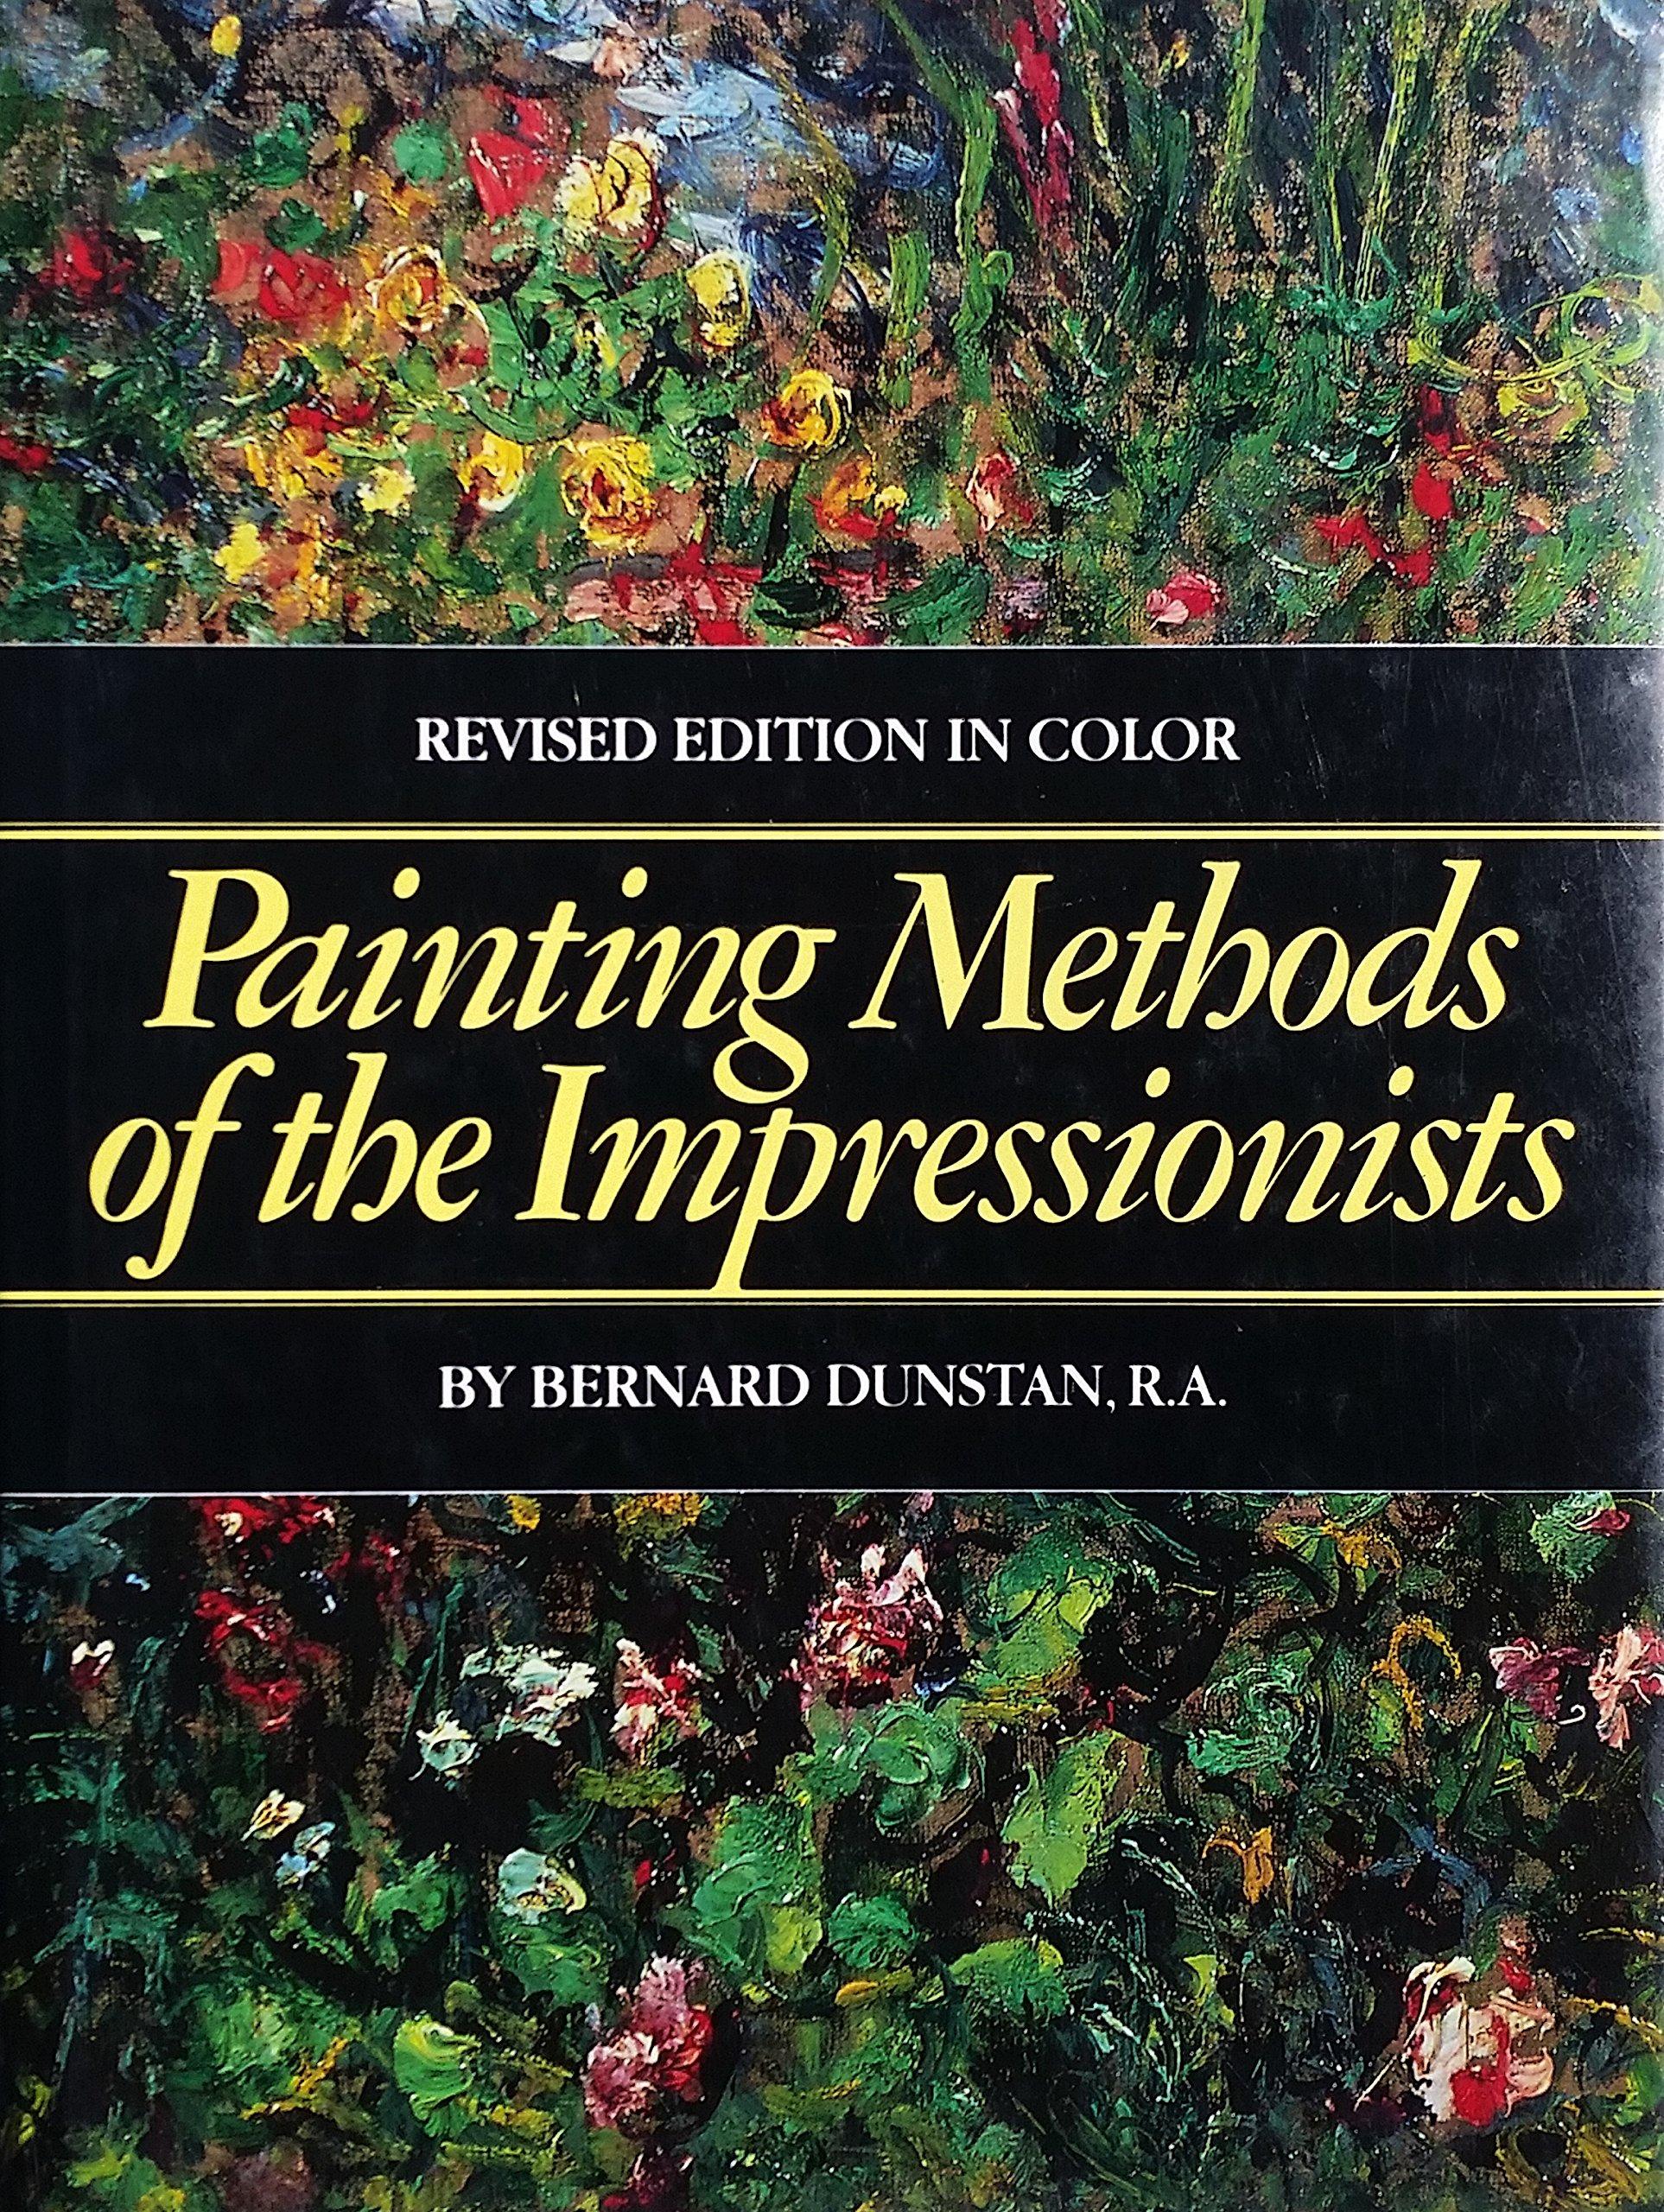 painting methods of the impressionists bernard dunstan